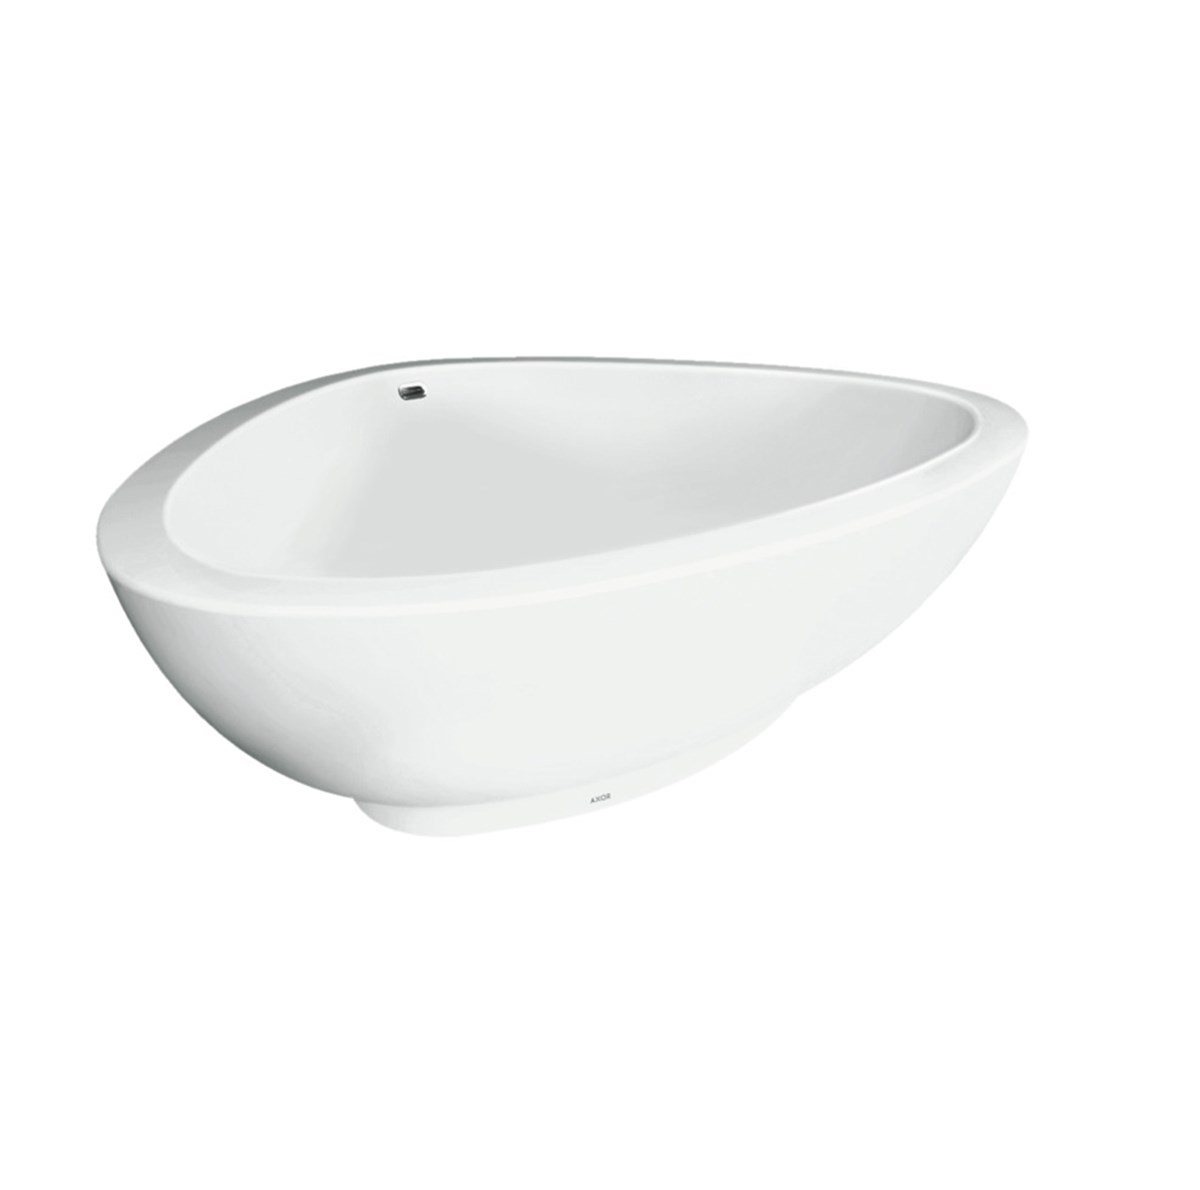 Hansgrohe Axor Massaud Baths